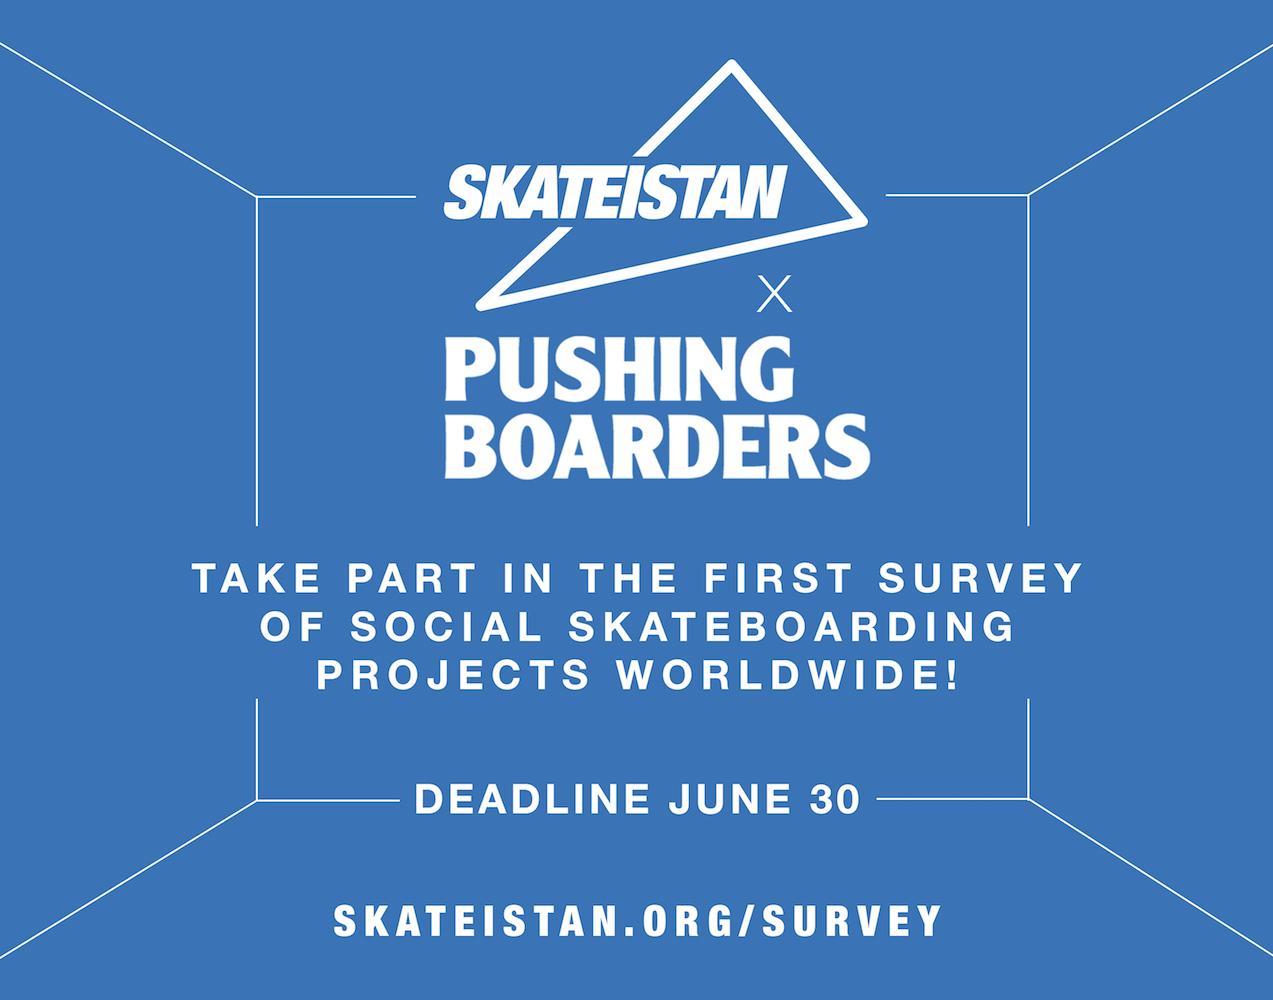 PB x Skateistan Poster_Print_A4_10 copy.jpg